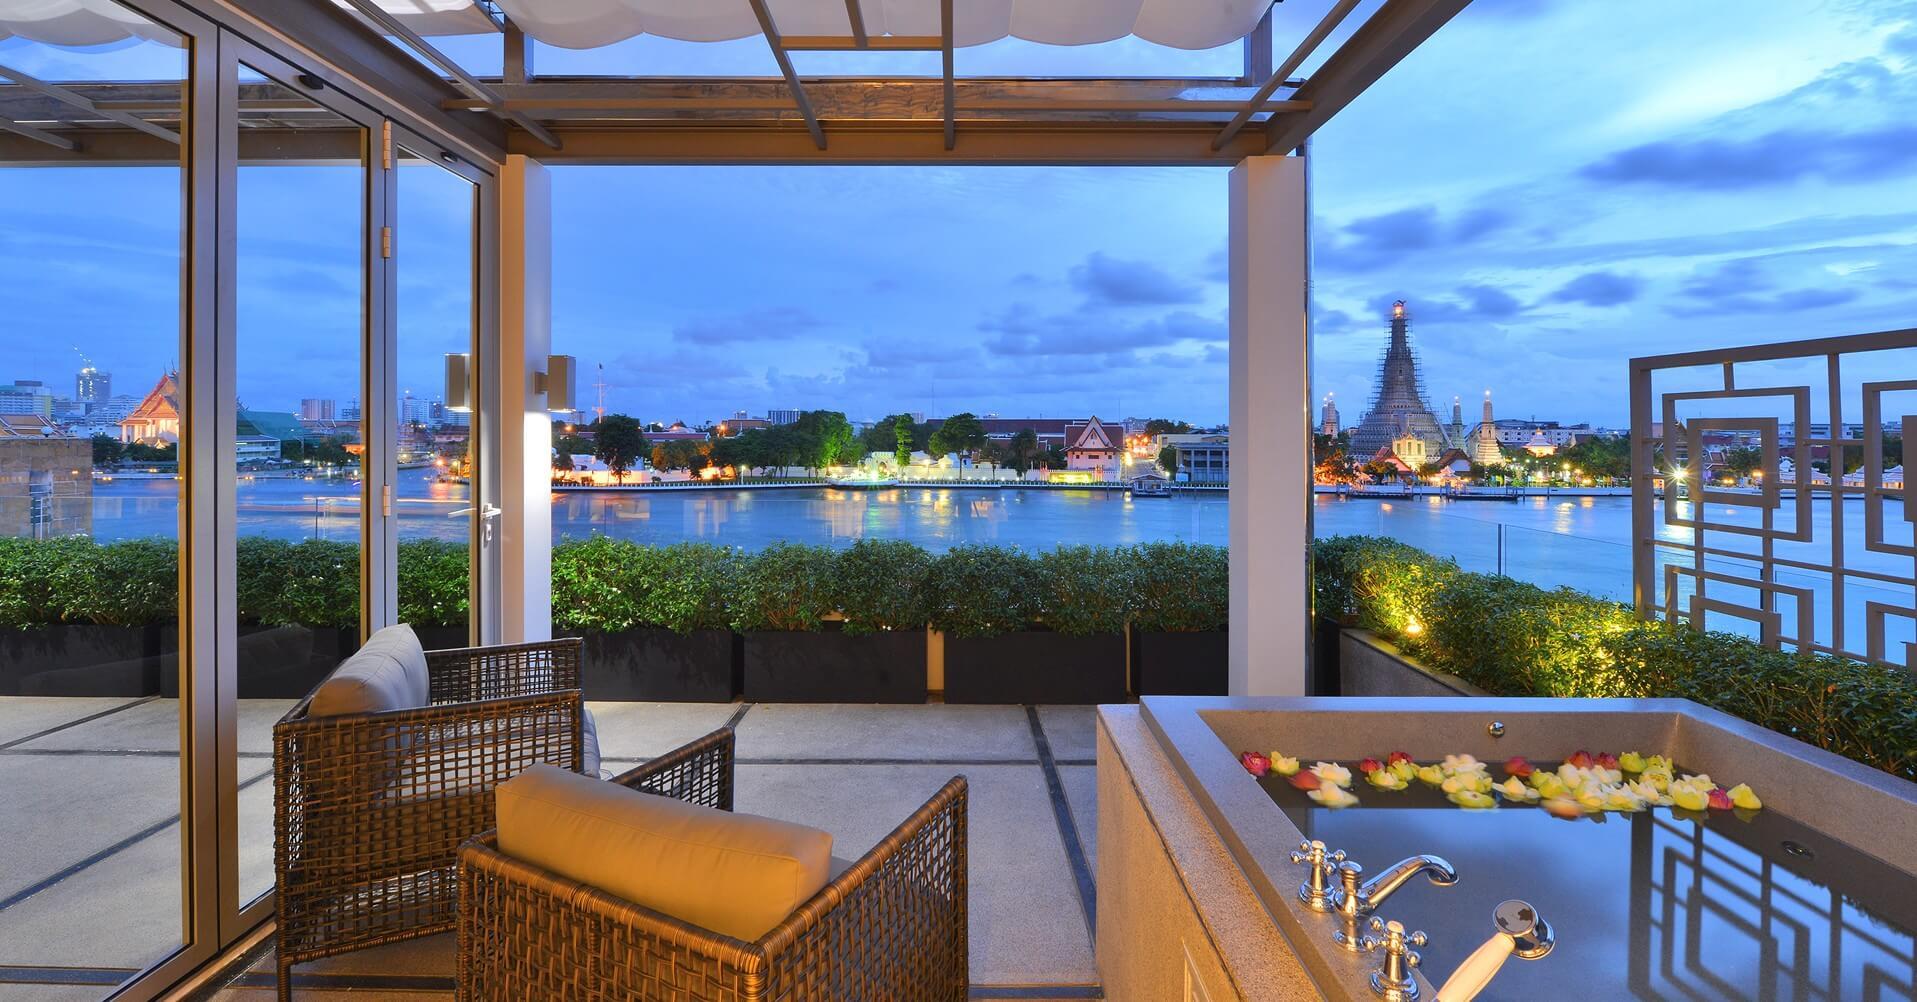 Riva Arun Premium Jacuzzi Suite - Riva Arun Bangkok